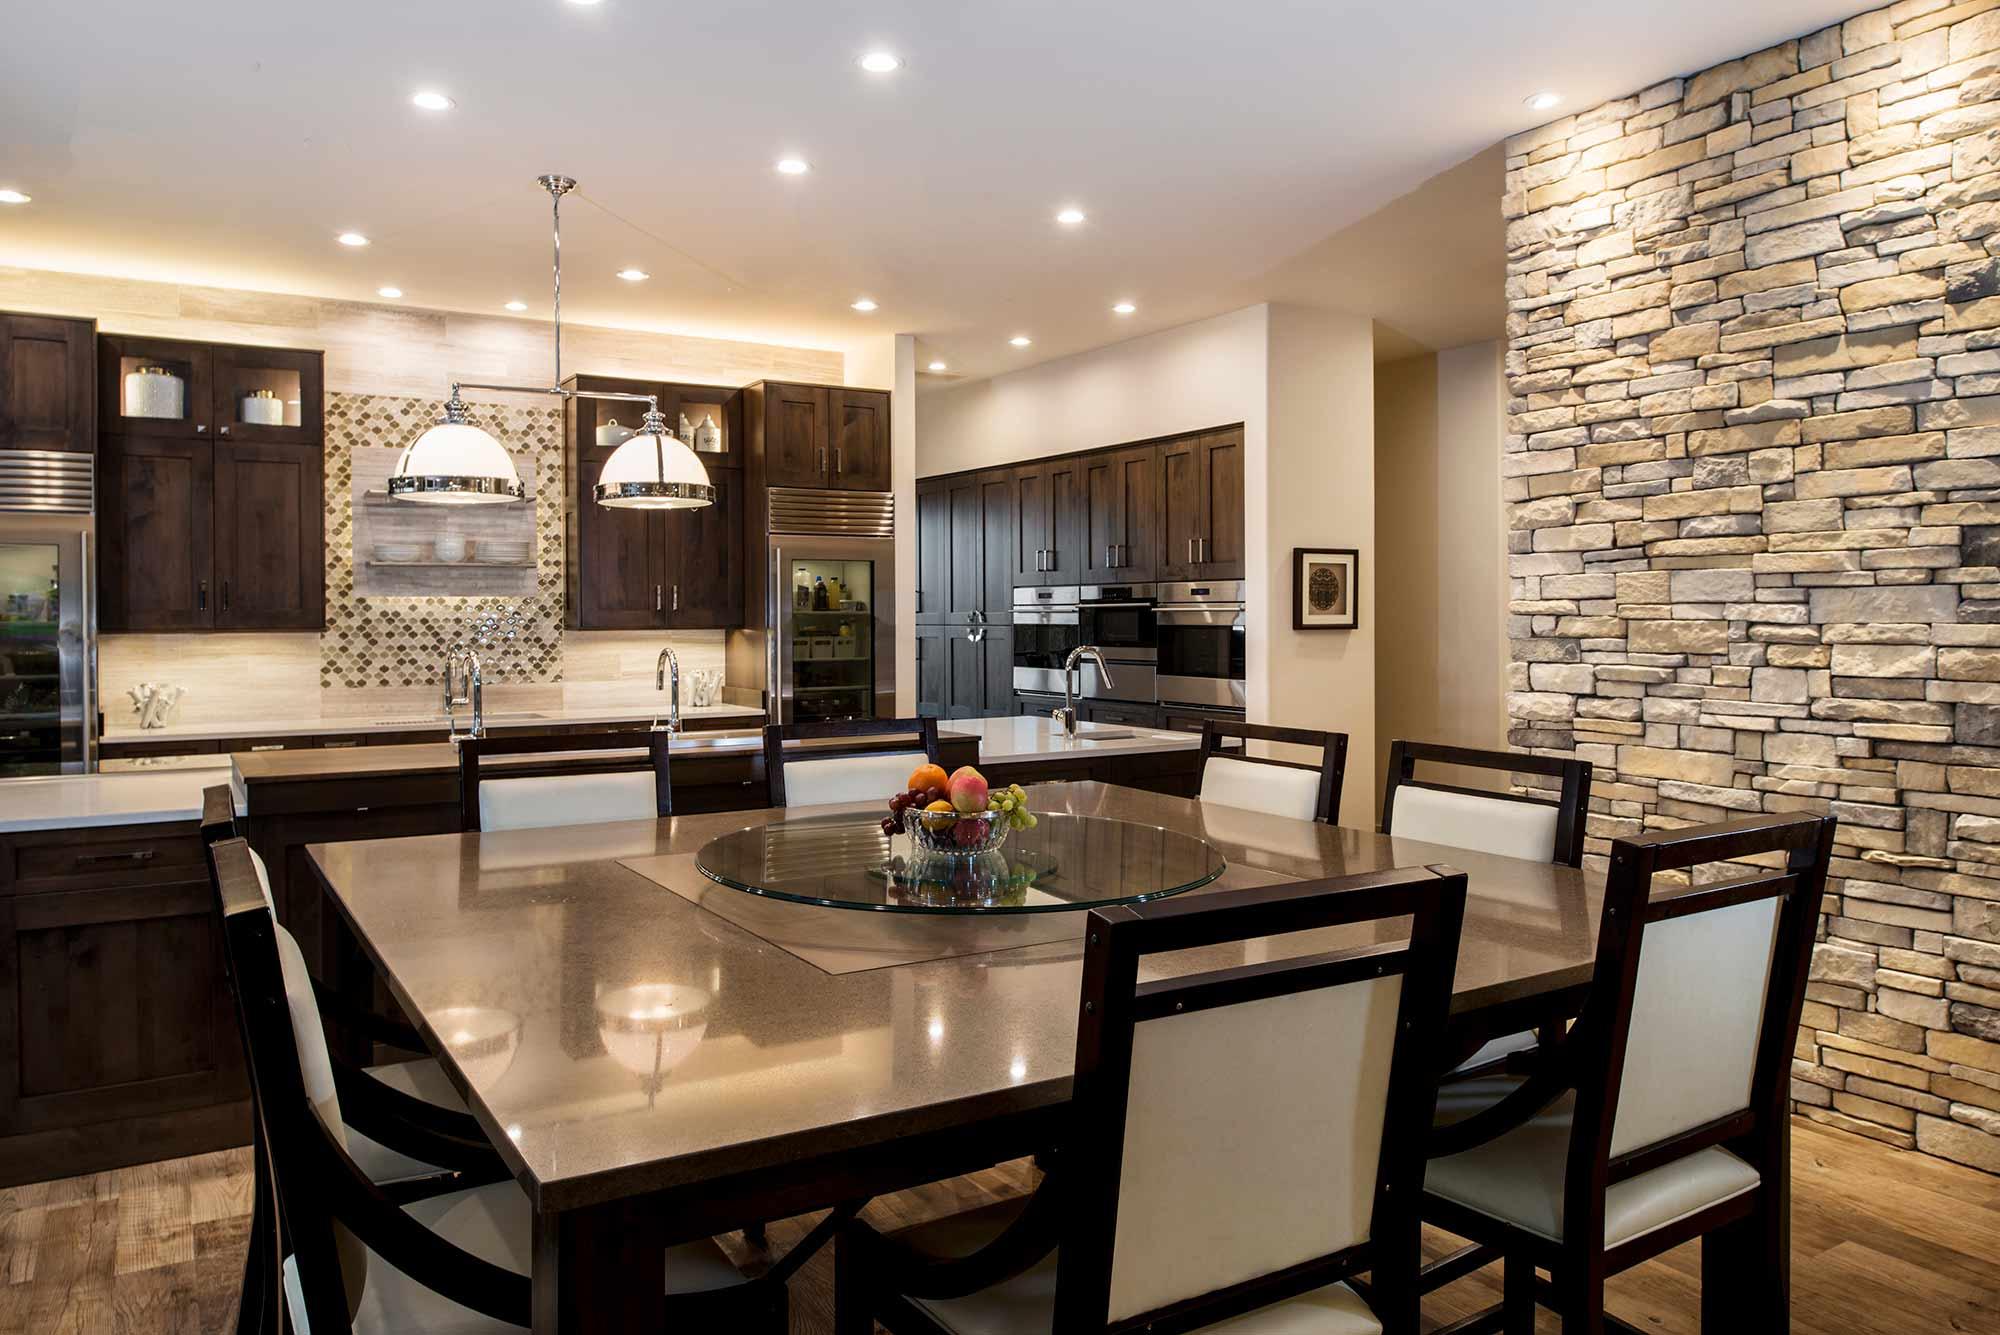 kitchen remodel okc industrial faucet ideas tulsa designer cabinetry